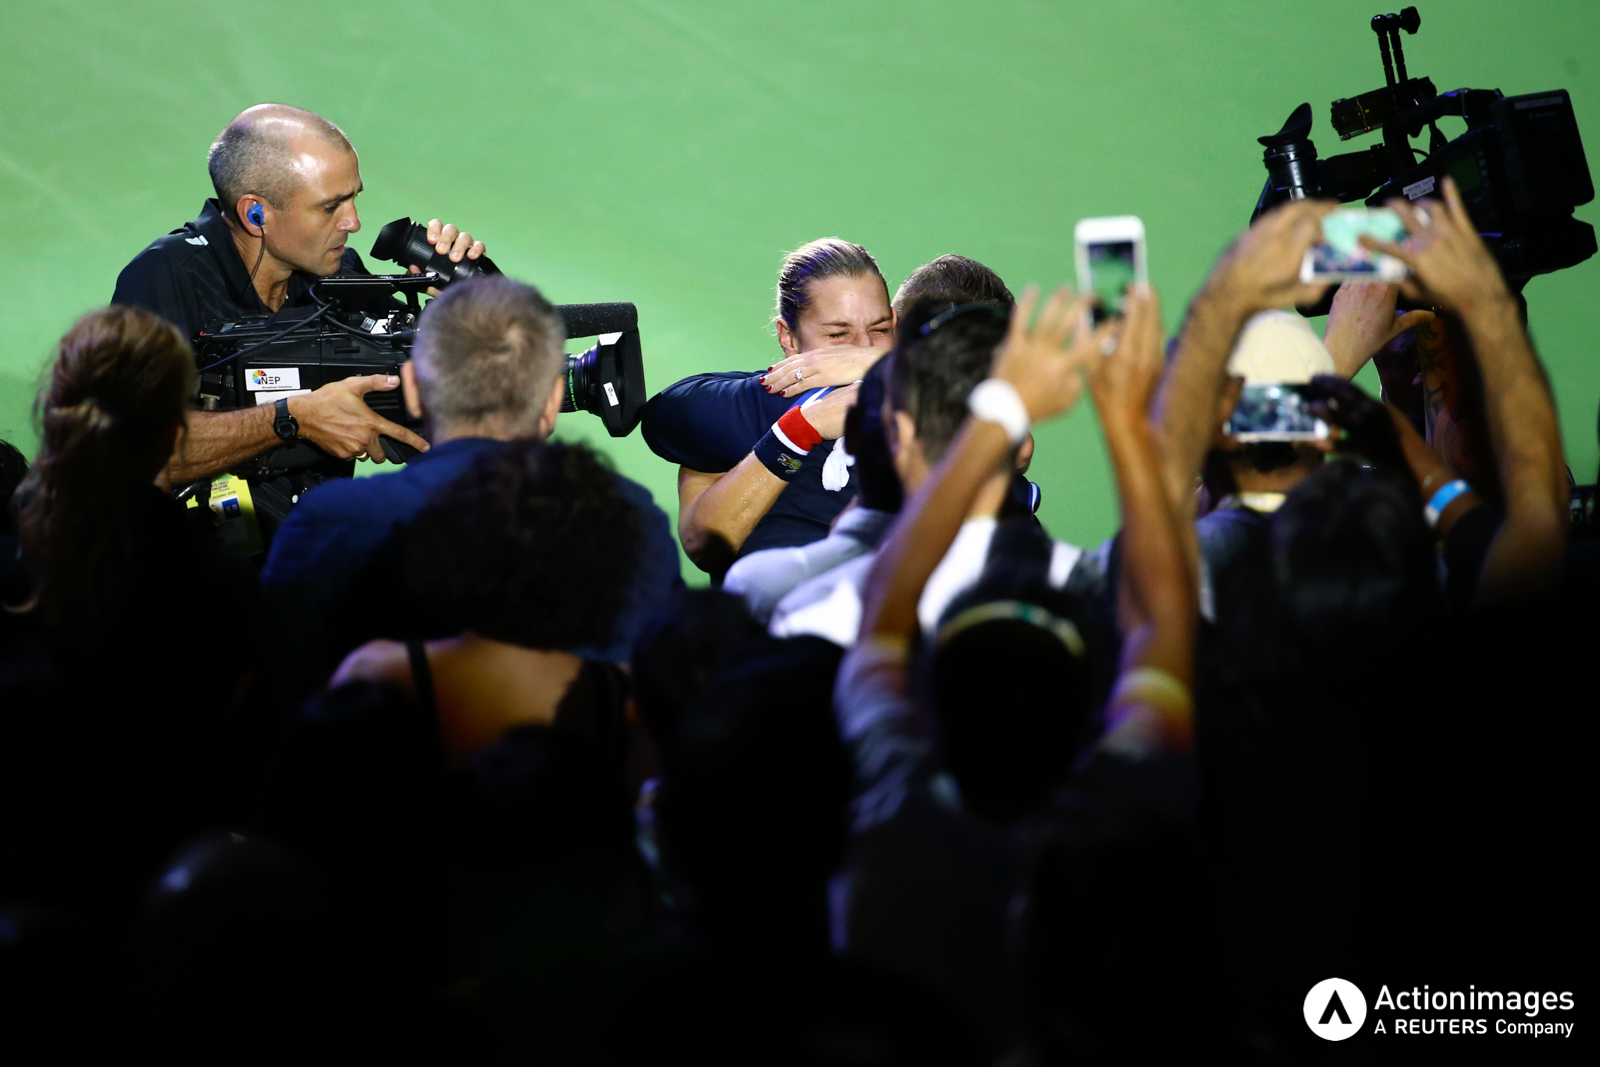 Tennis - BNP Paribas WTA Finals - Singapore Indoor Stadium - 30/10/16 Slovakia's Dominika Cibulkova celebrates winning the final Mandatory Credit: Action Images / Yong Teck Lim Livepic